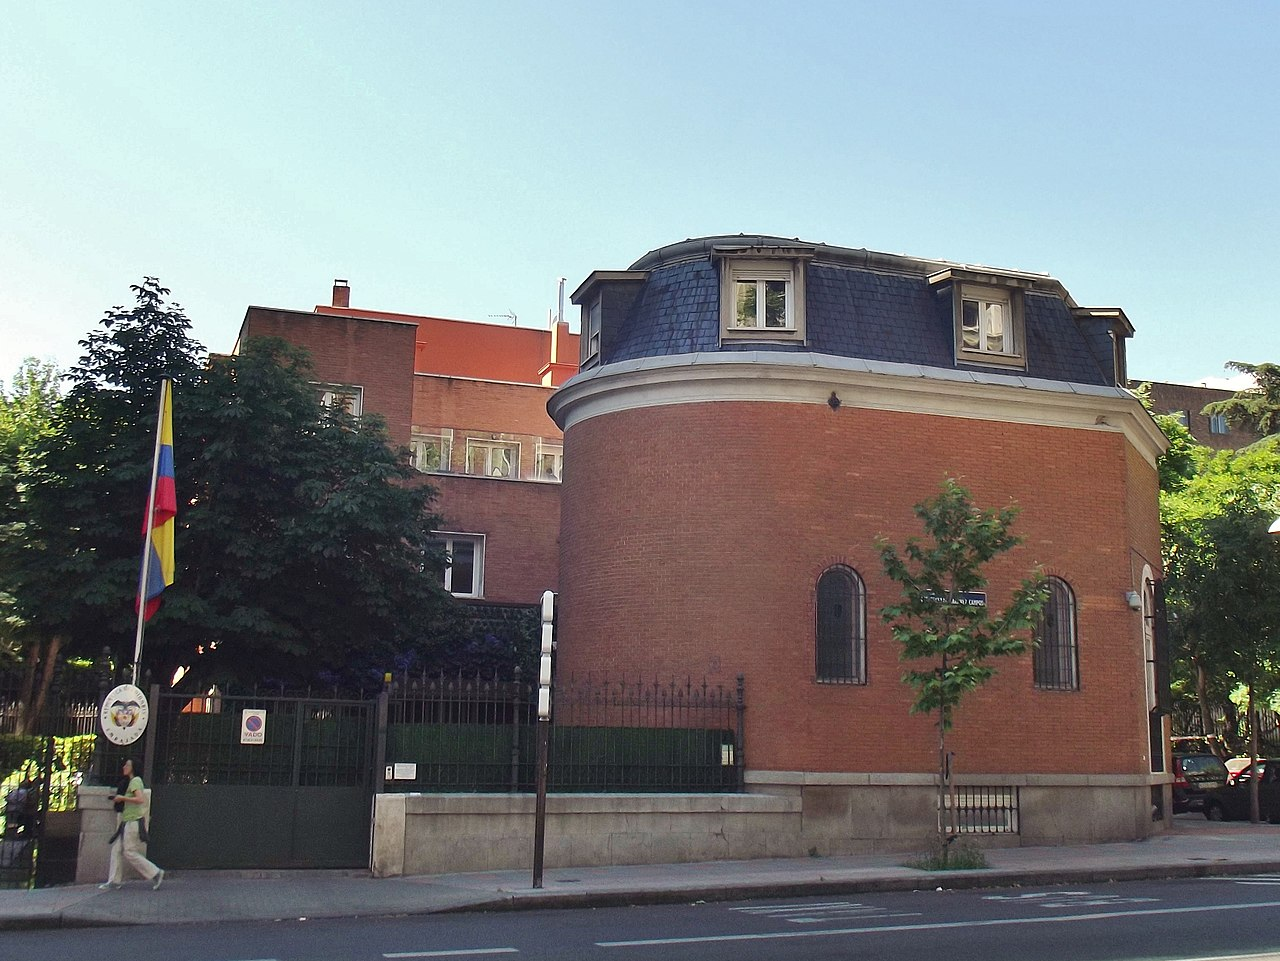 File:Embajada De Colombia, Madrid.JPG